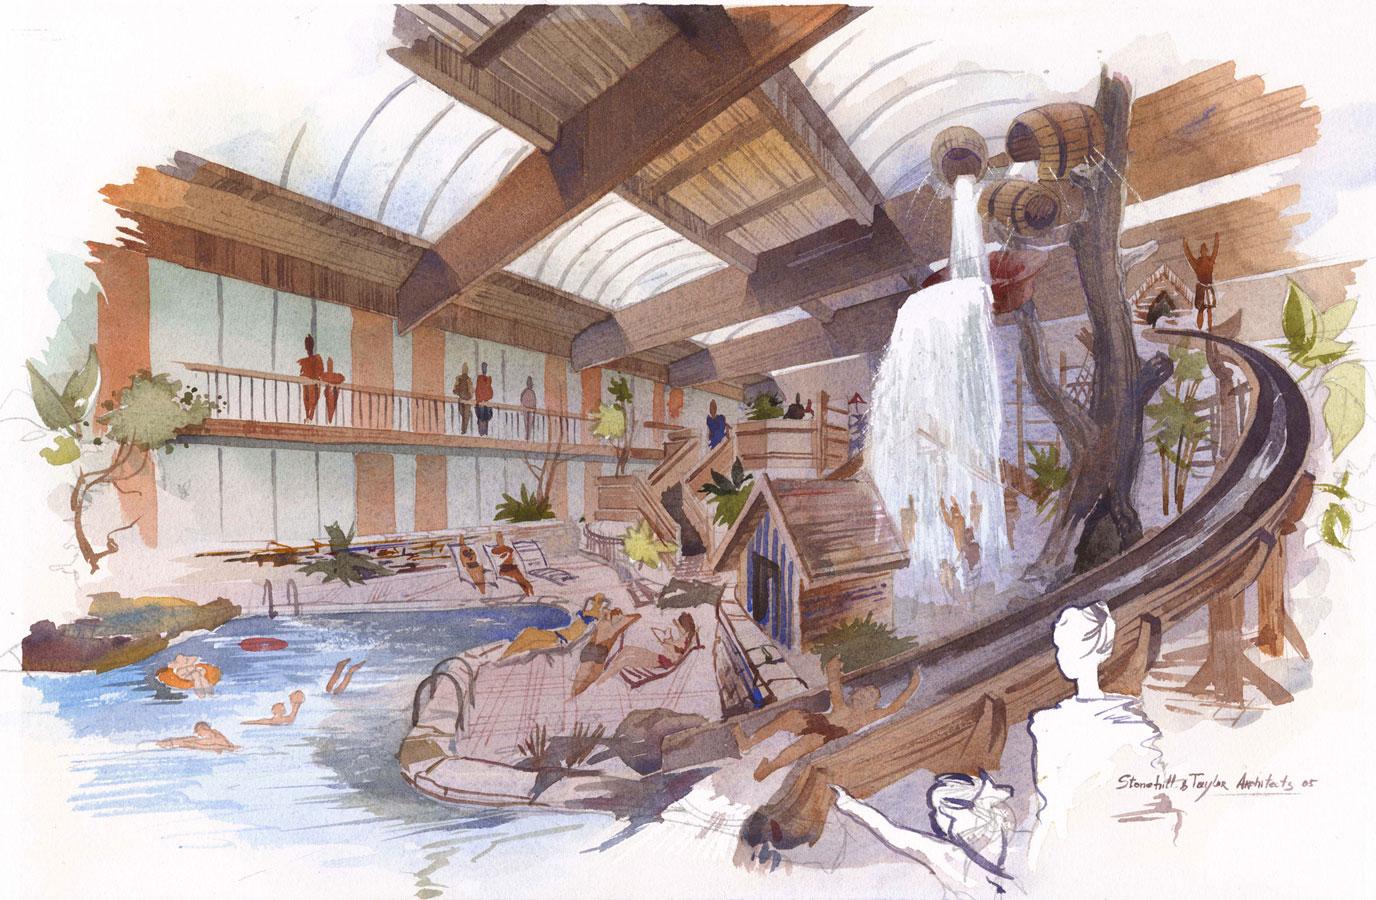 Conceptual predesign sketch pencil photoshop architecture design idea aquapark interior shalum Shalumov